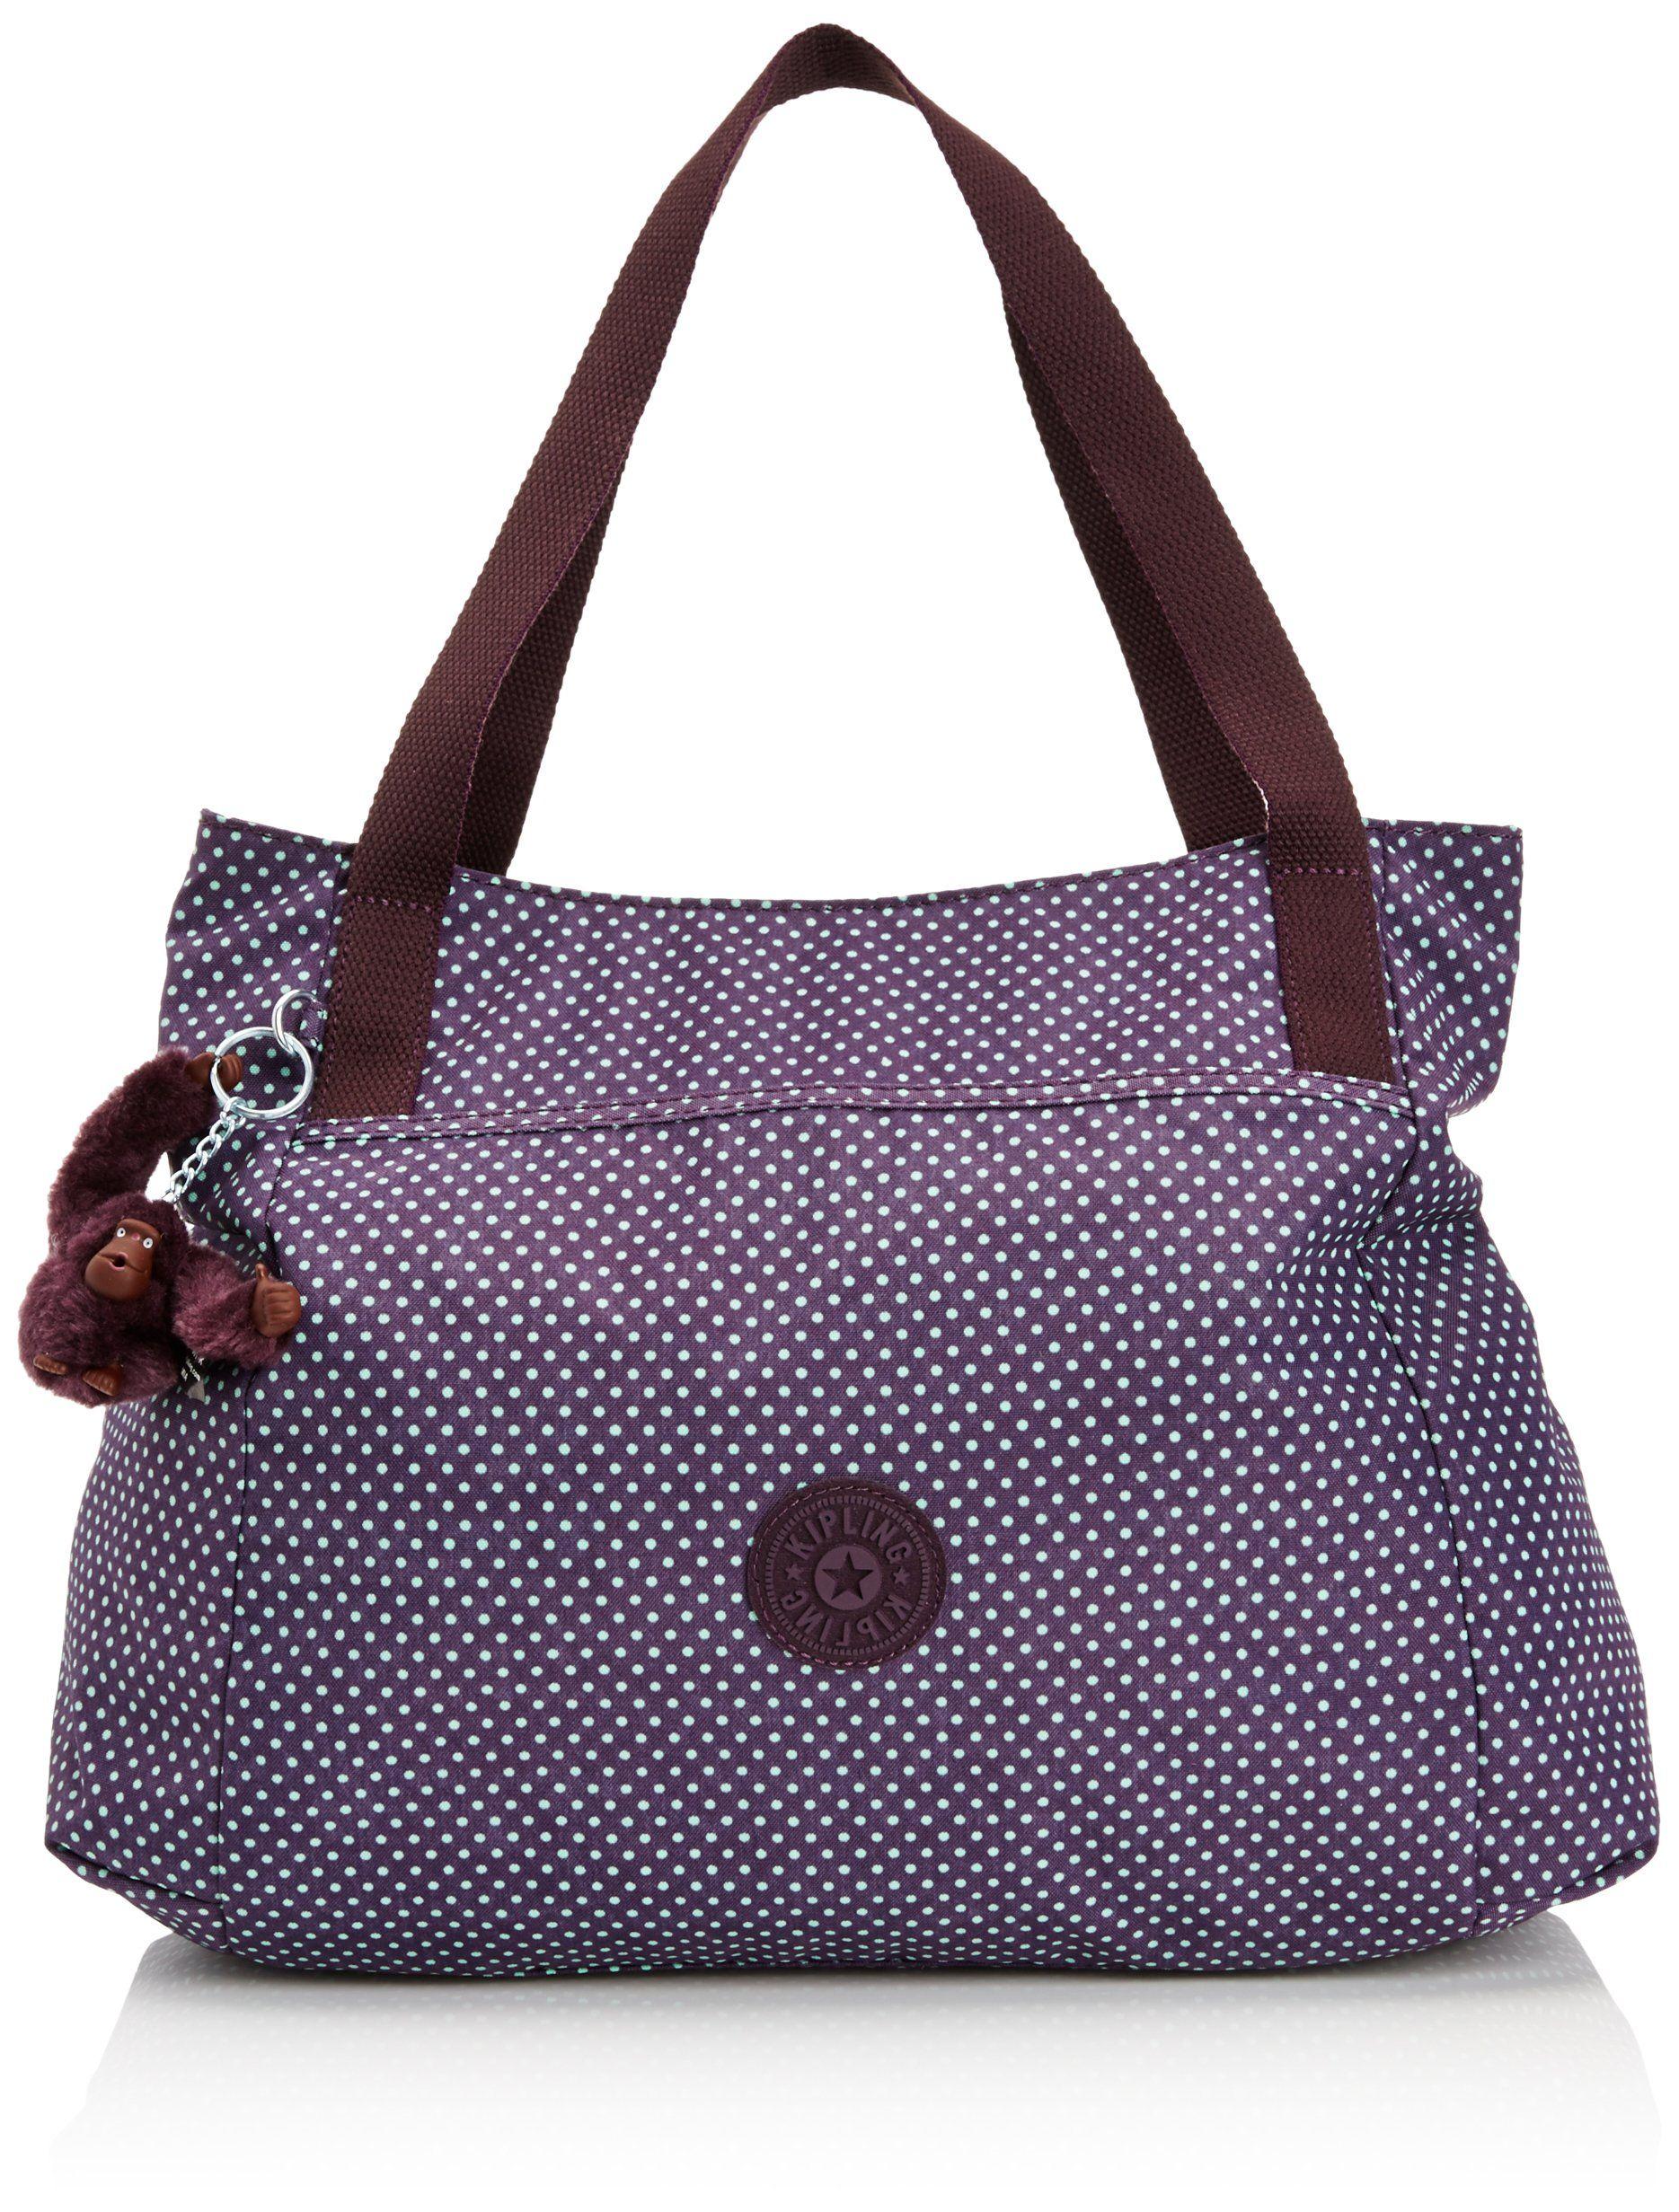 Kipling Amiel In Winter Paisley Pinterest Bags Top Handle And